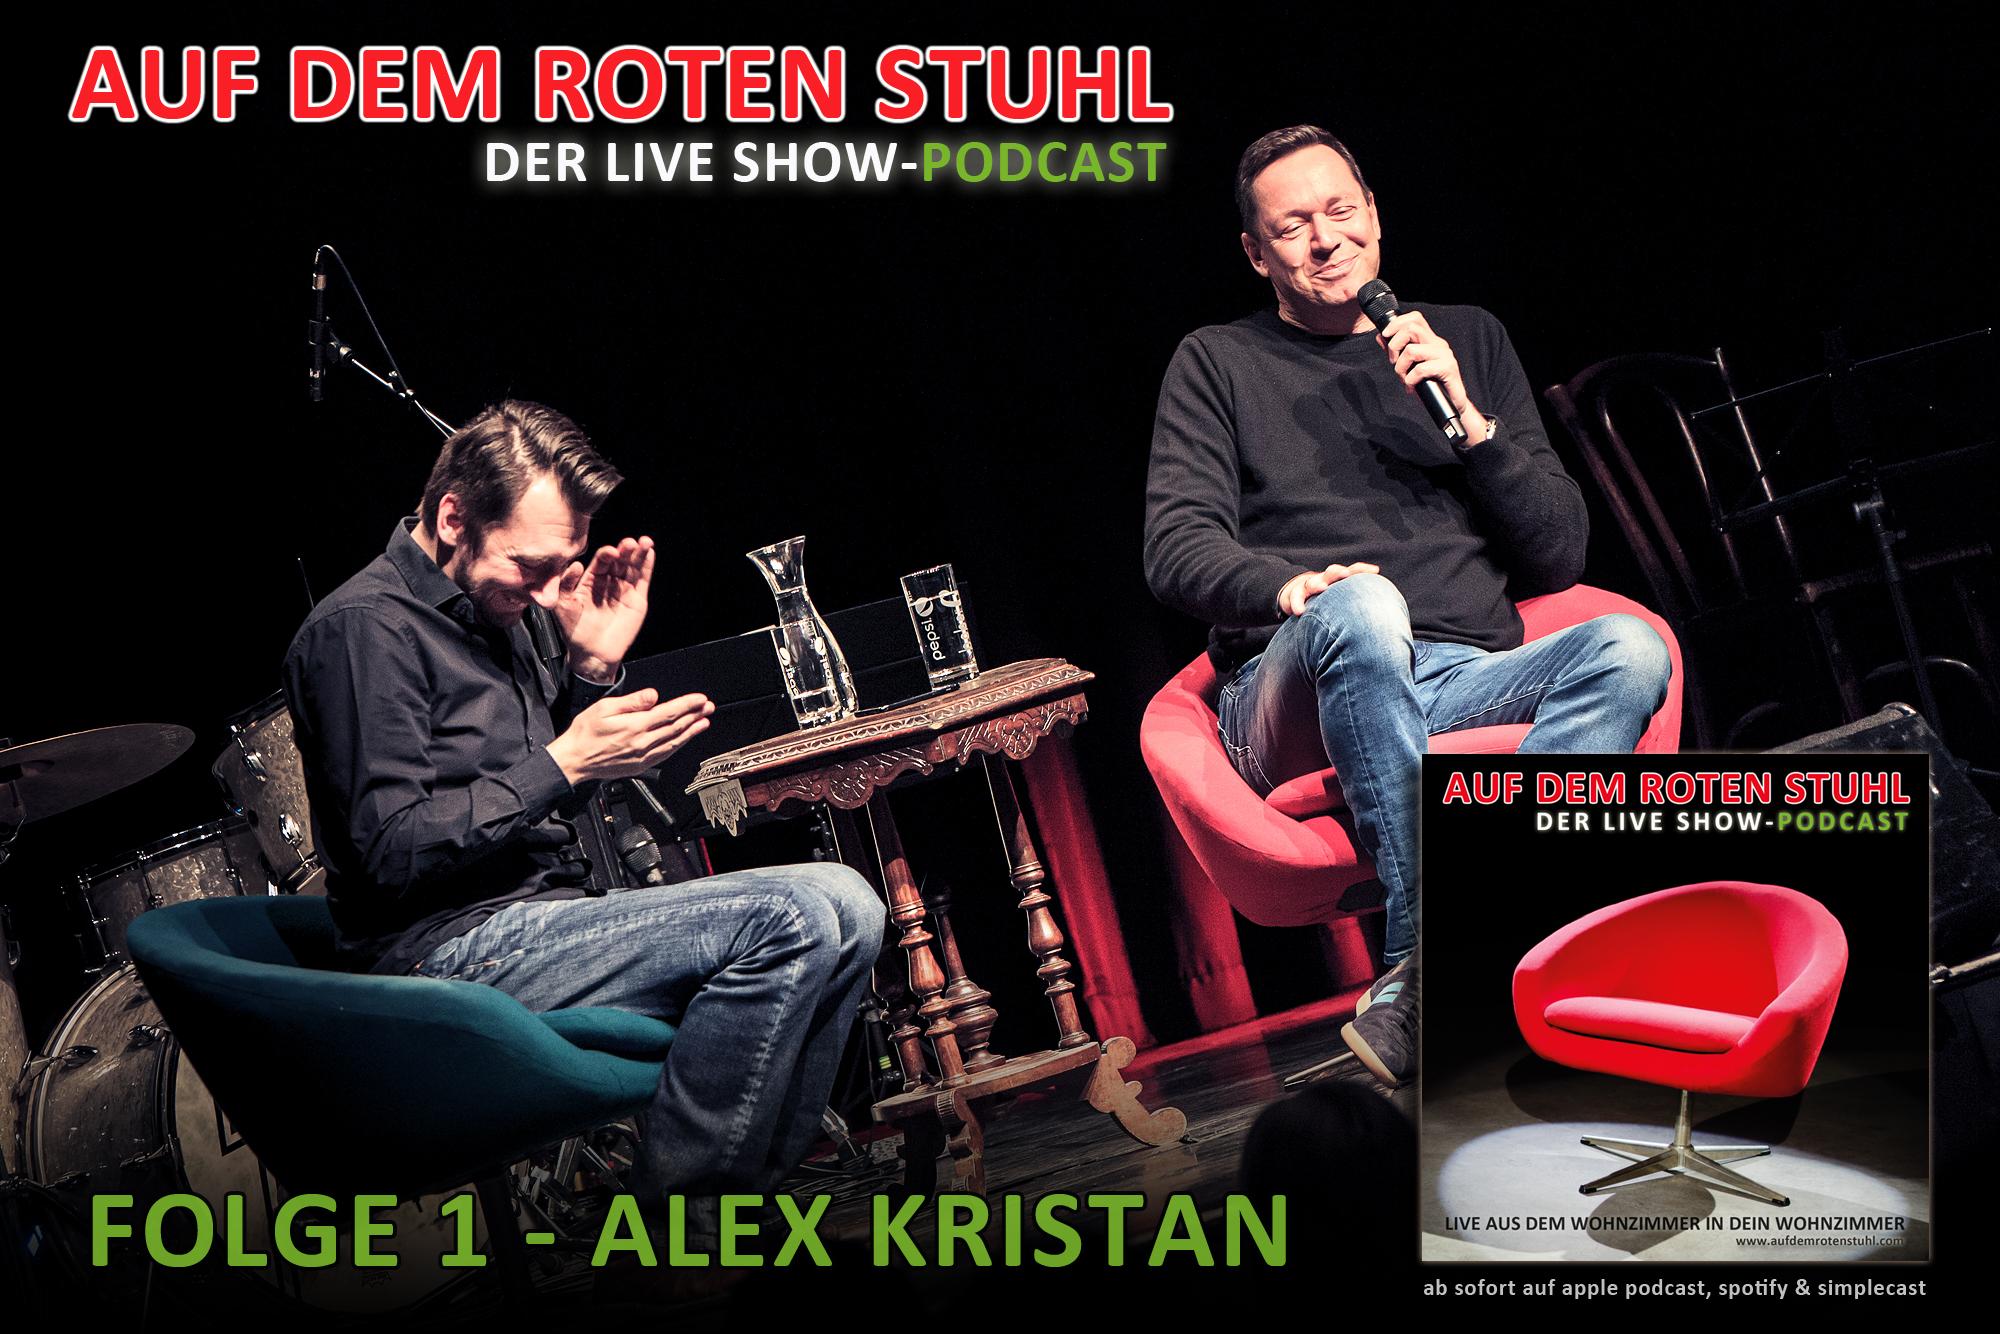 Auf_dem_roten_Stuhl_Podcast_Live_Show_Folge1_Alex_Kristan